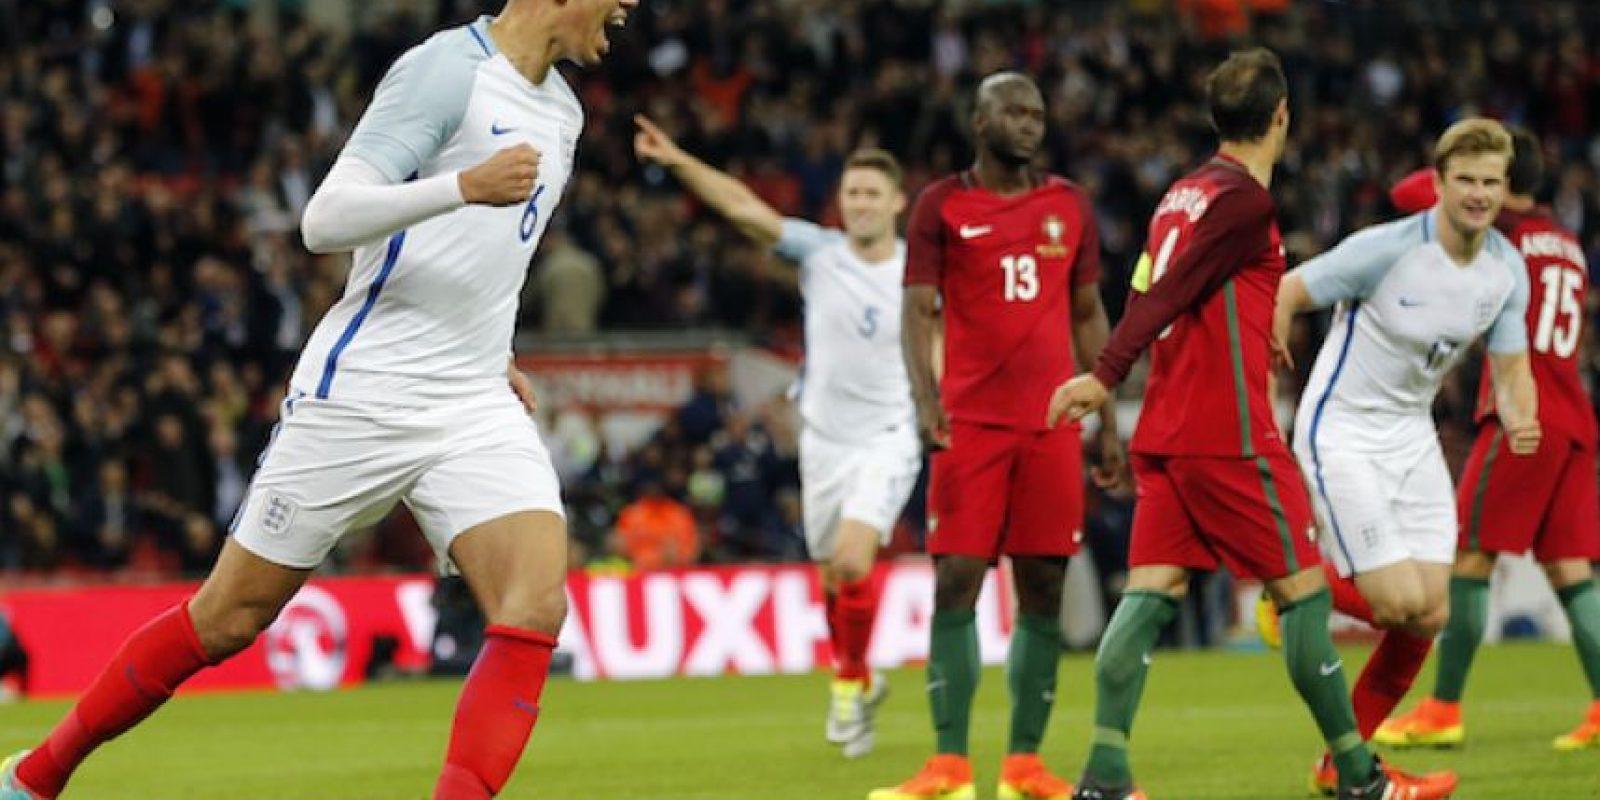 Inglaterra se impuso a Portugal en amistoso Foto:Getty Images